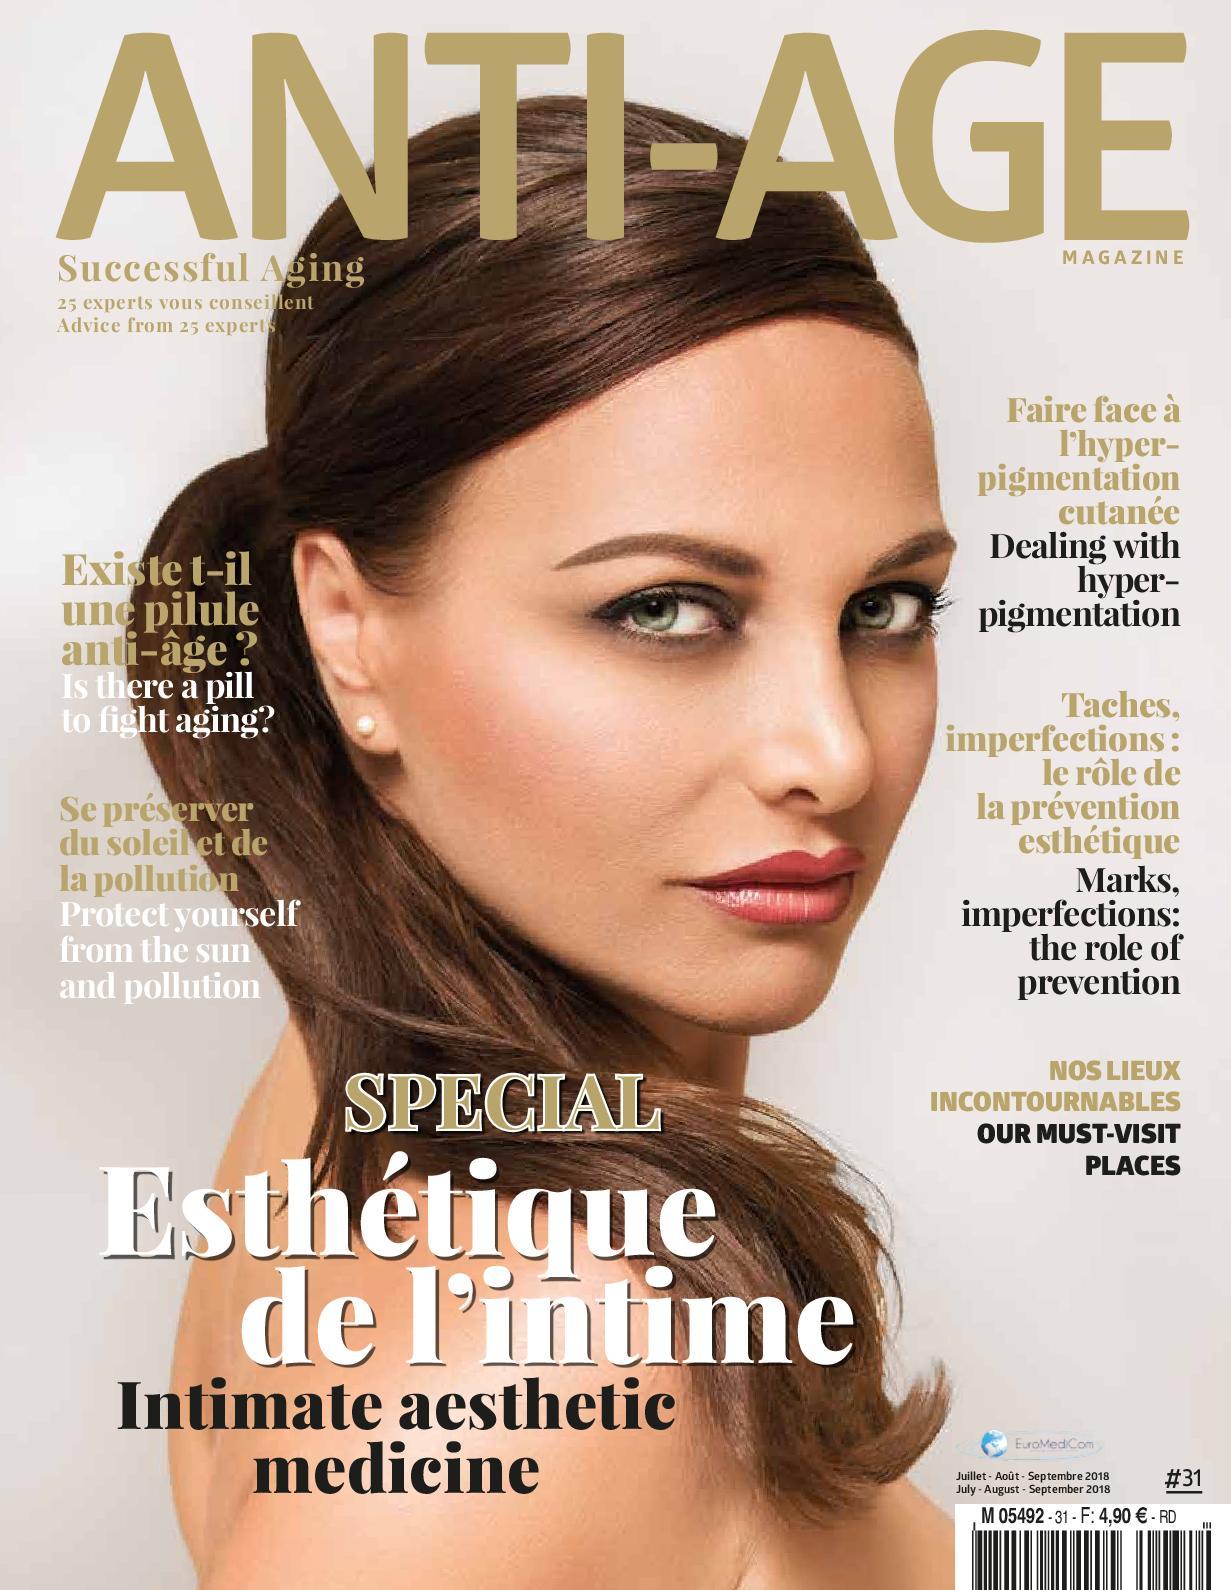 ANTI-AGE Magazine #31